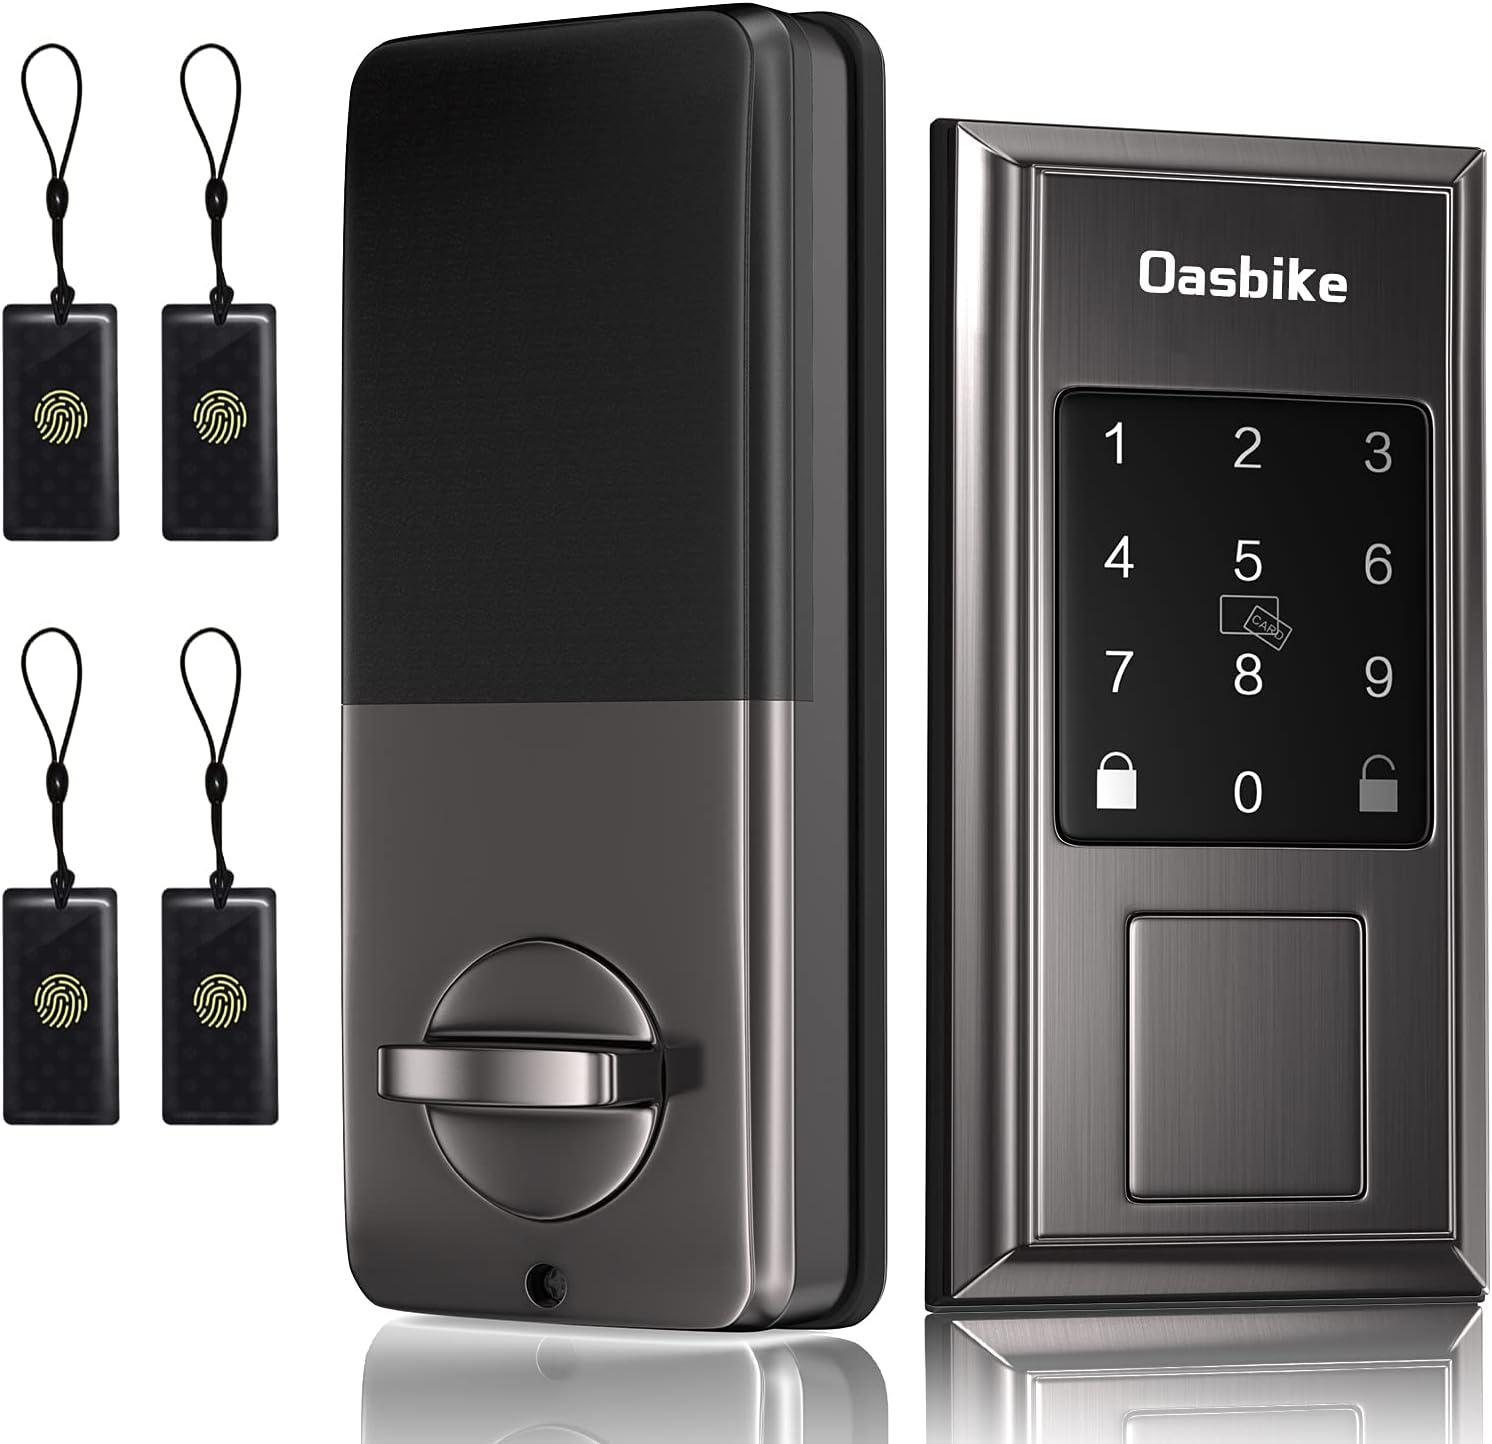 Oasbike Smart Lock, Keyless Door Locks for Homes, Touchscreen Keypad, Keyless Entry Door Lock Featuring Auto-Locking Suitable for Alexa & Google Assistant, Satin Nickel